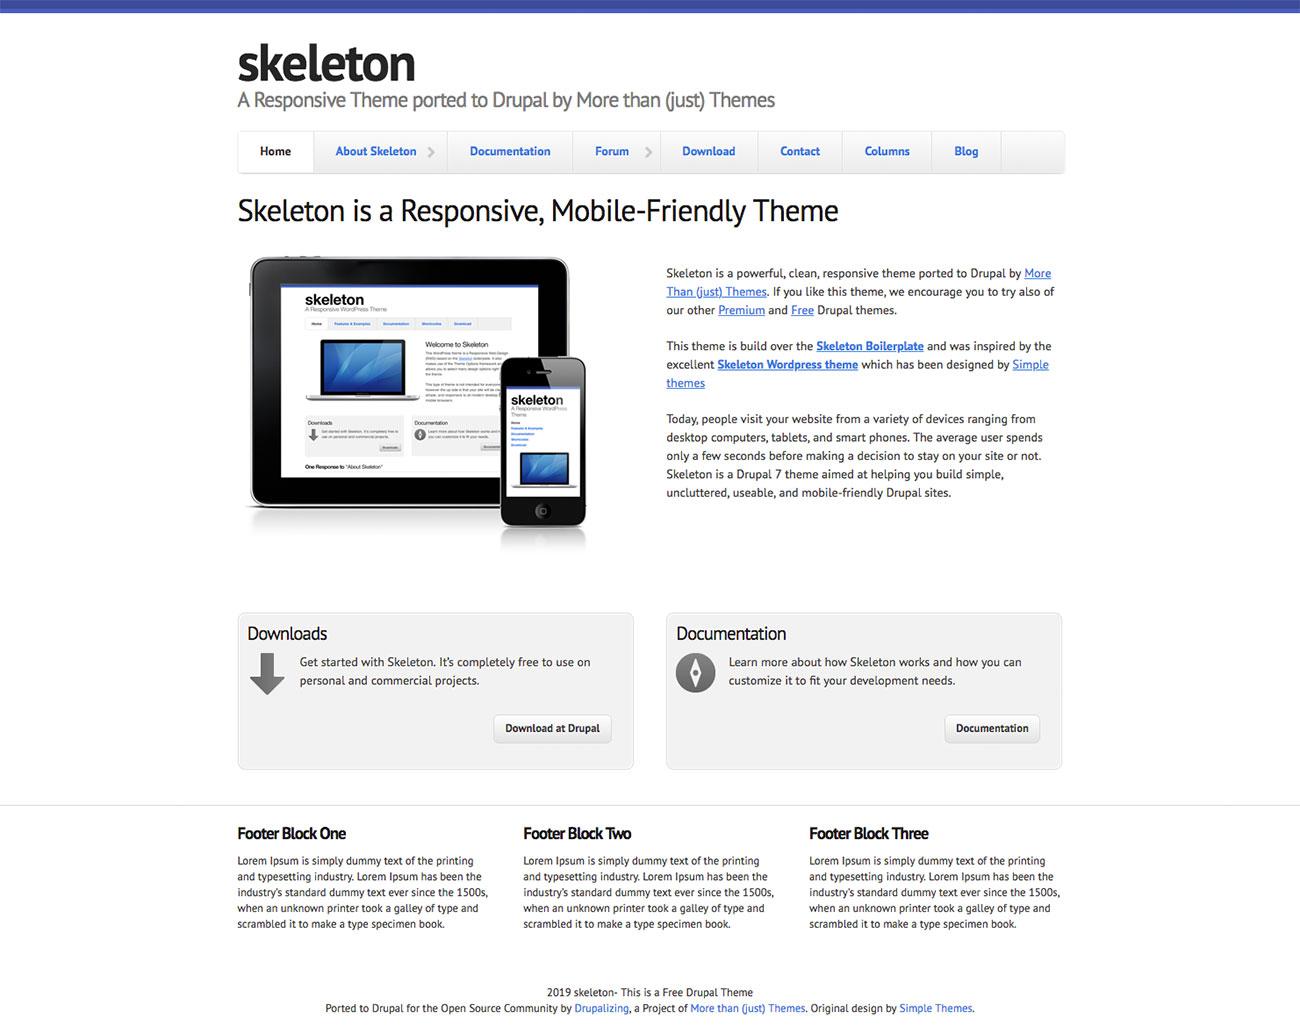 Free Drupal themes: Skeleton